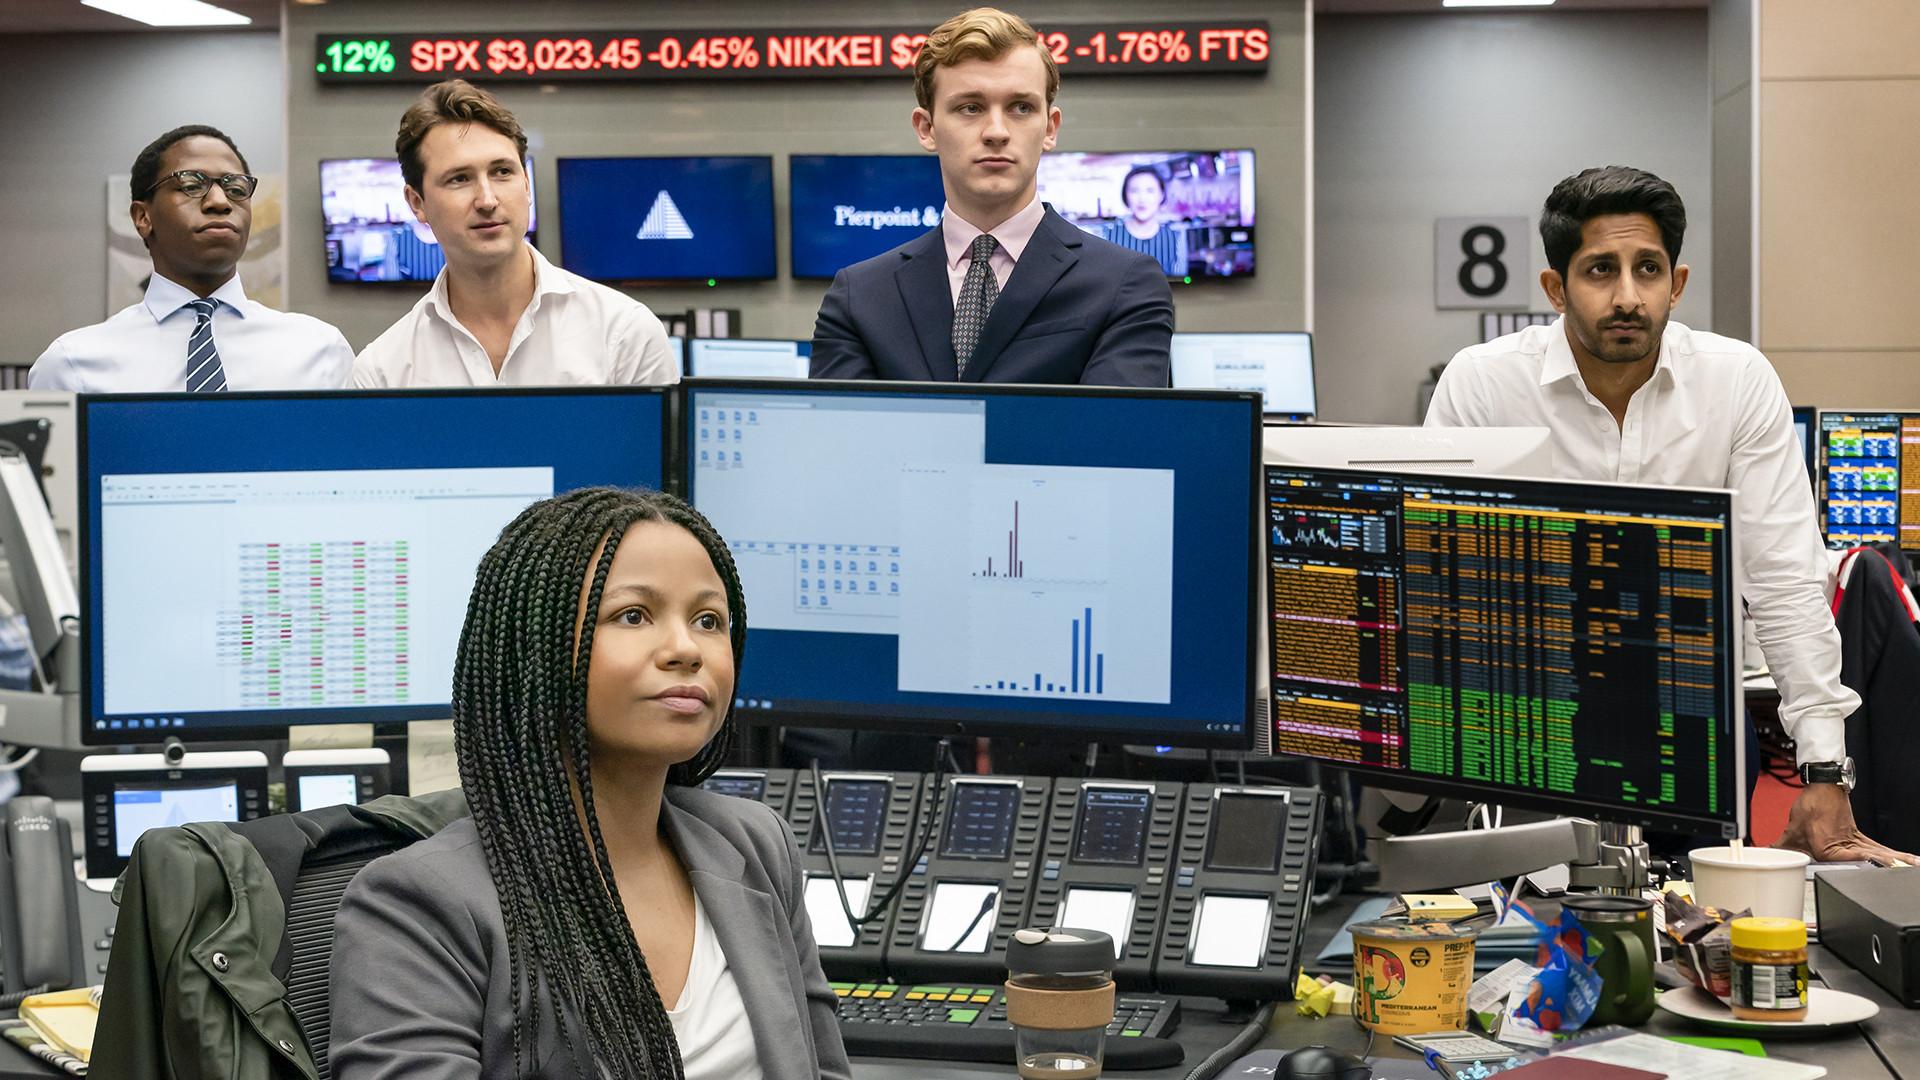 HBO/Bad Wolf: Industry Season I